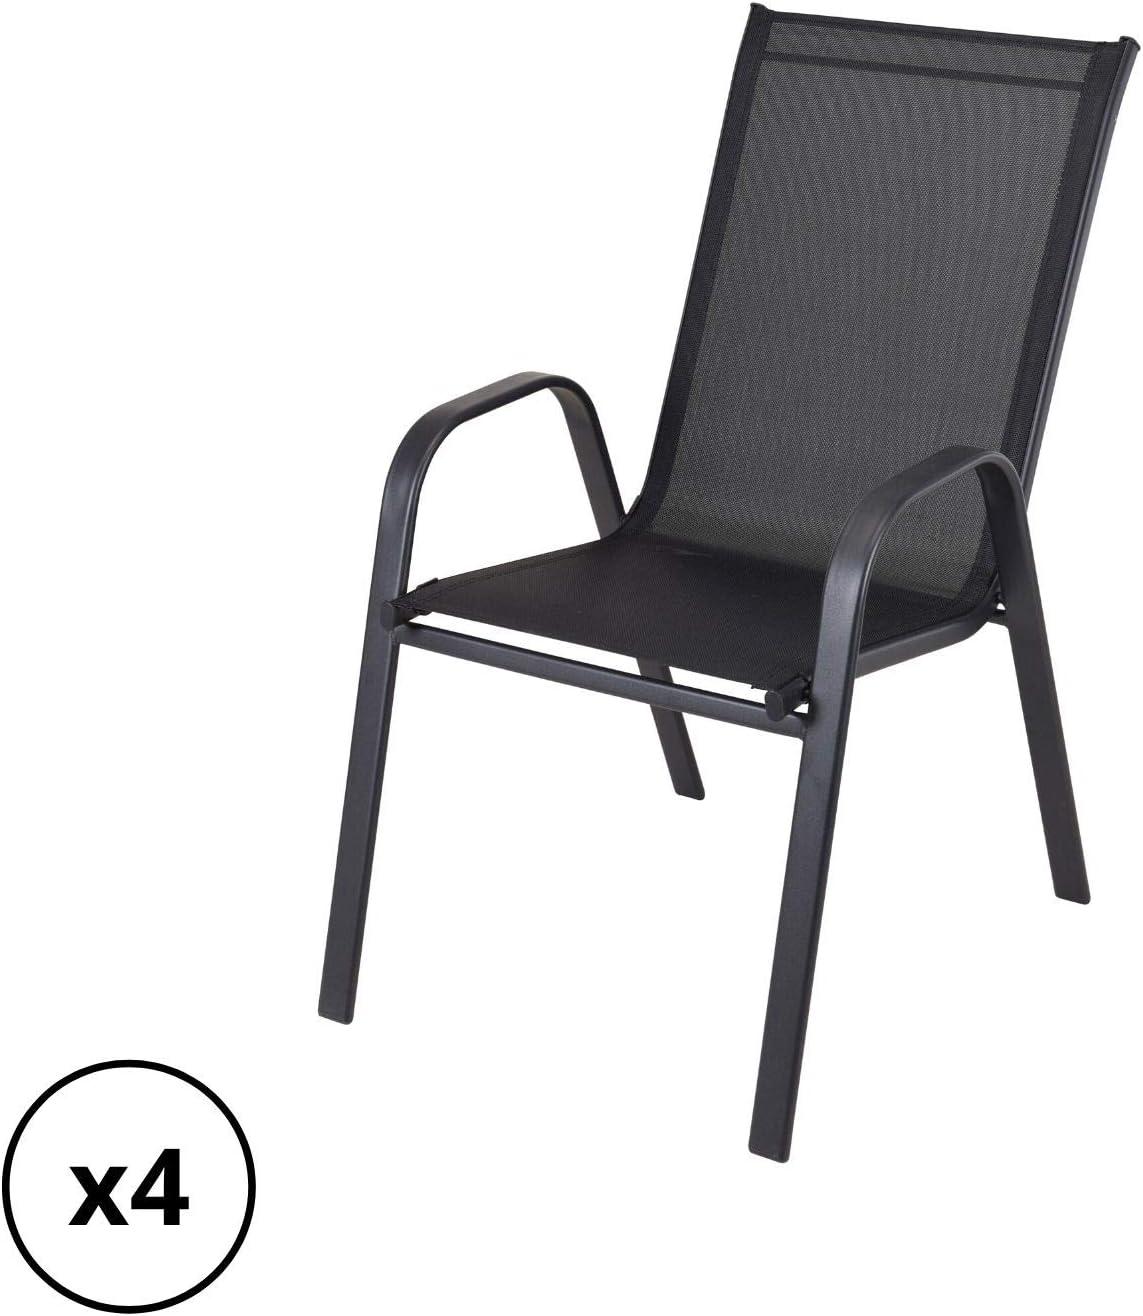 Dawsons Living Stacking Garden Chairs - Relaxing High Back Garden